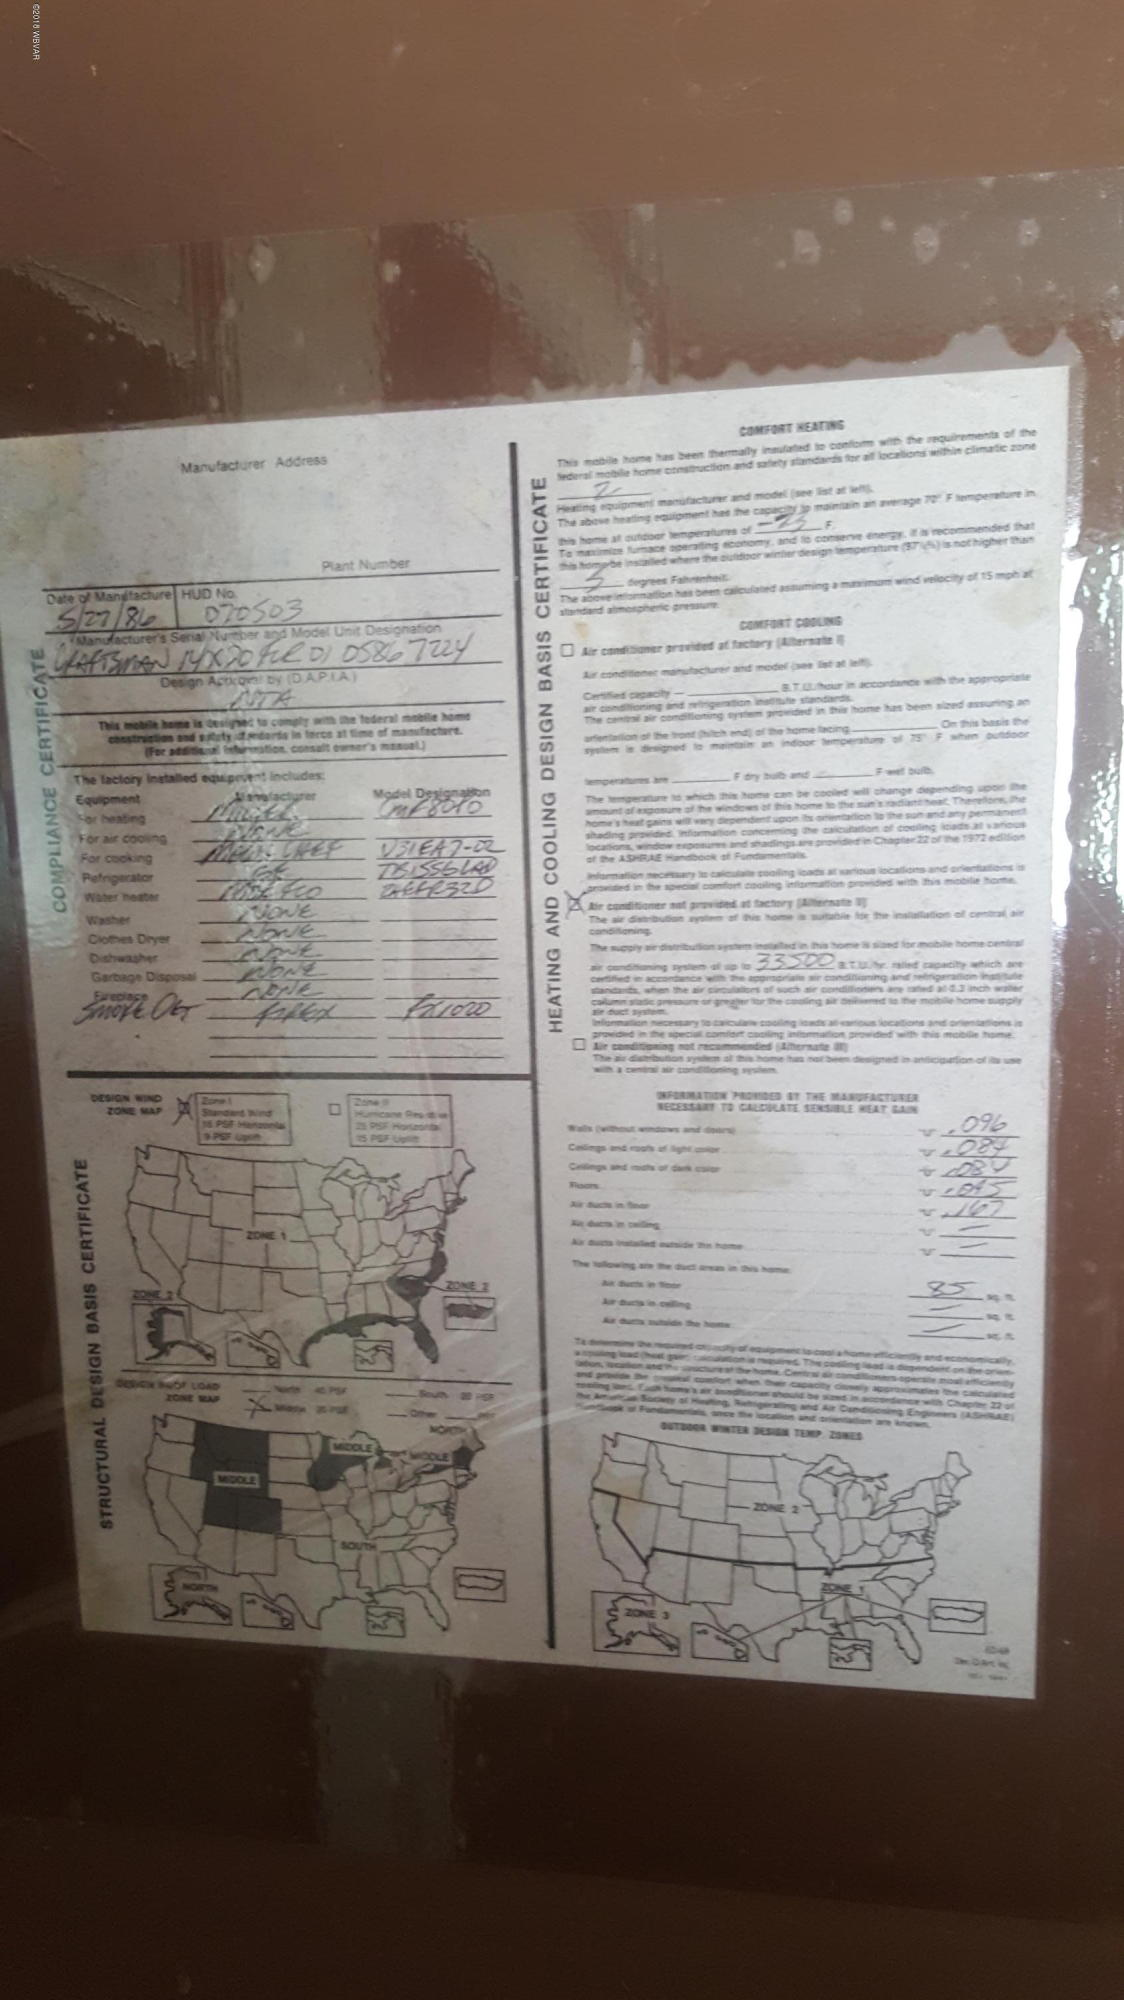 14888 BERWICK TURNPIKE,Gillett,PA 16925,2 Bedrooms Bedrooms,1 BathroomBathrooms,Residential,BERWICK,WB-85995